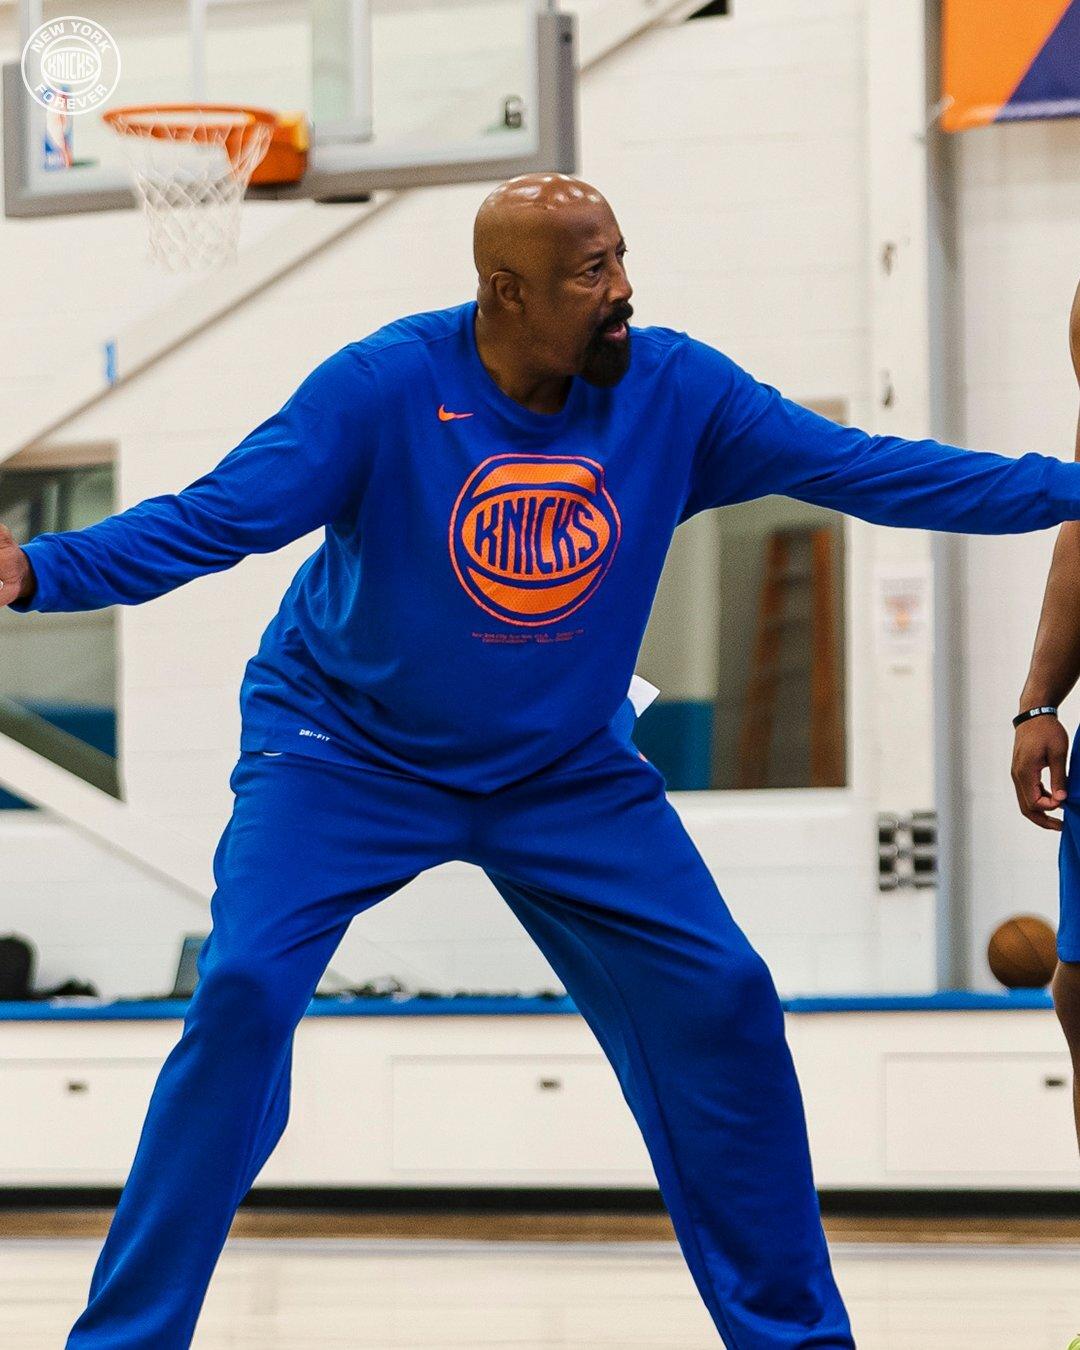 Knicks Head Coach Mike Woodson